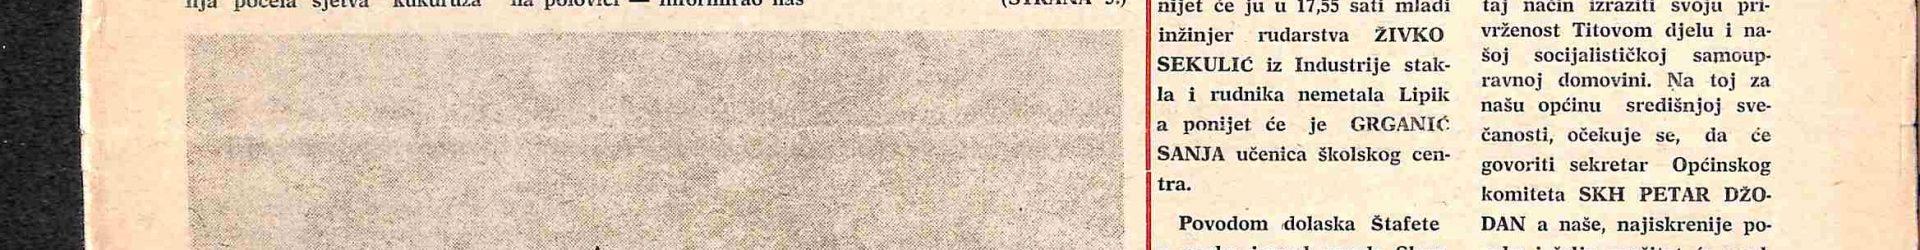 17 travnja 1981_Page_1